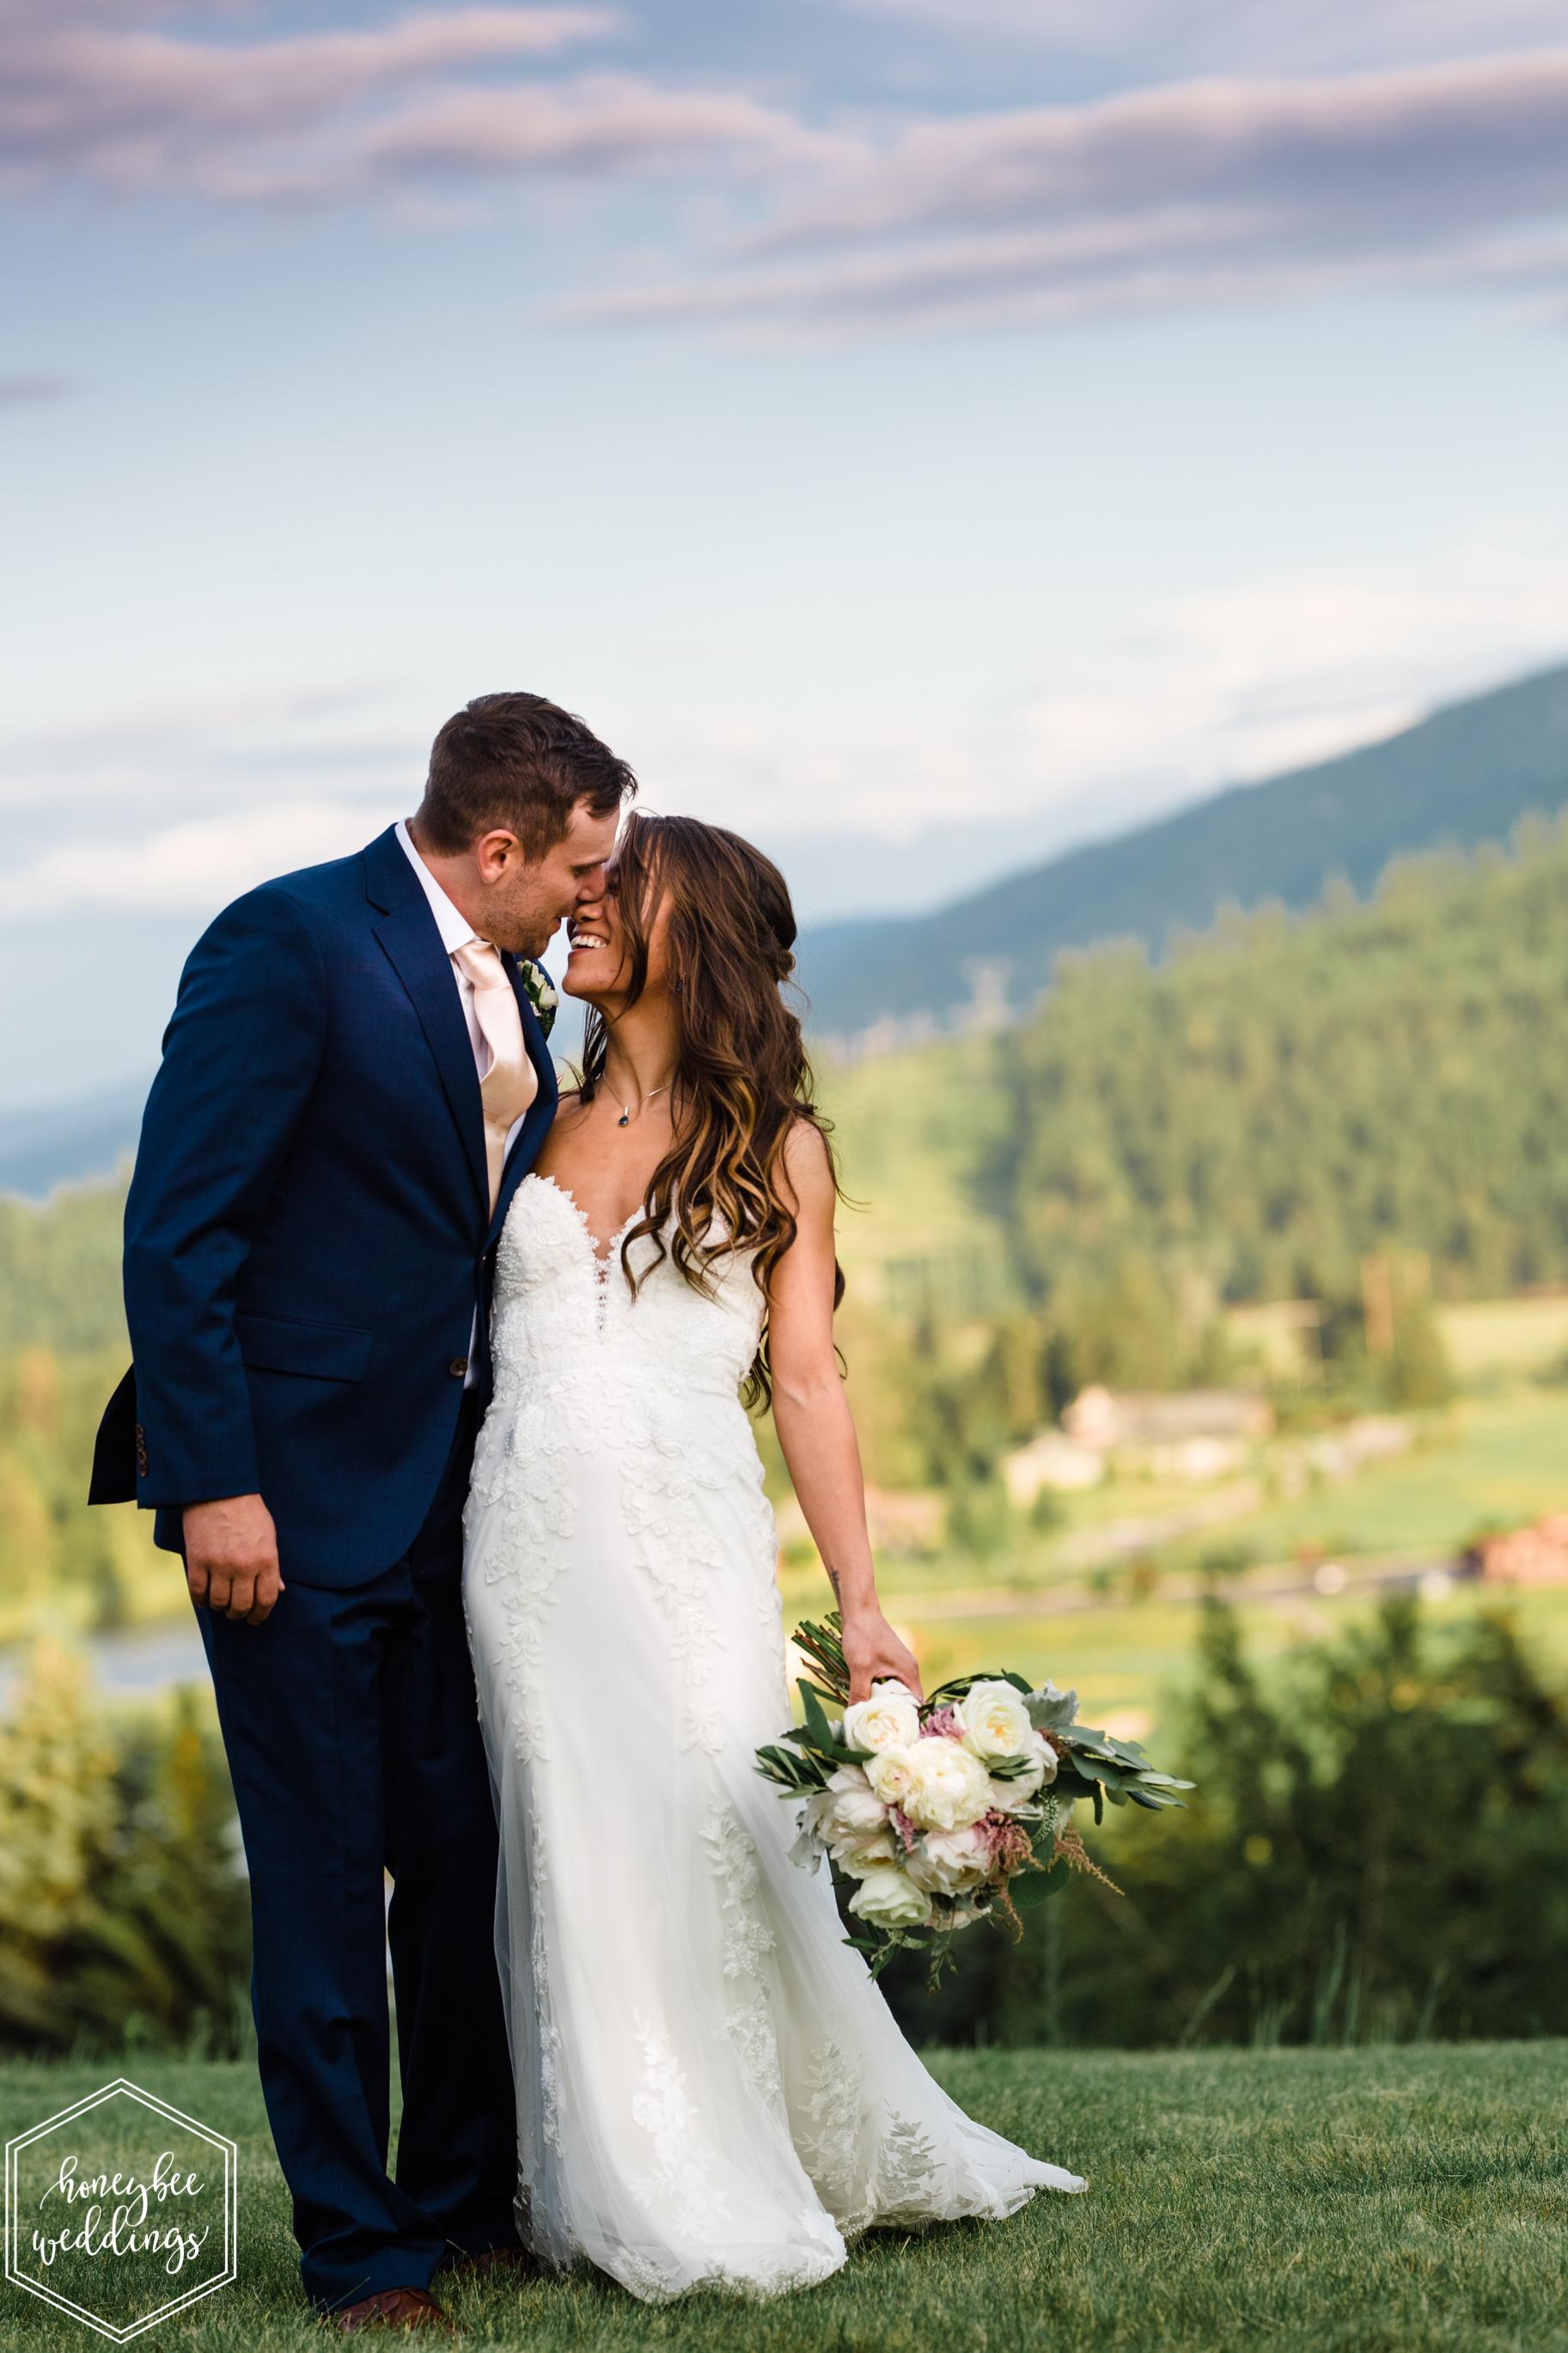 100Montana Wedding Photographer_Missoula Wedding_Honeybee Weddings_Devlin & Jacob_June 22, 2019-2210.jpg